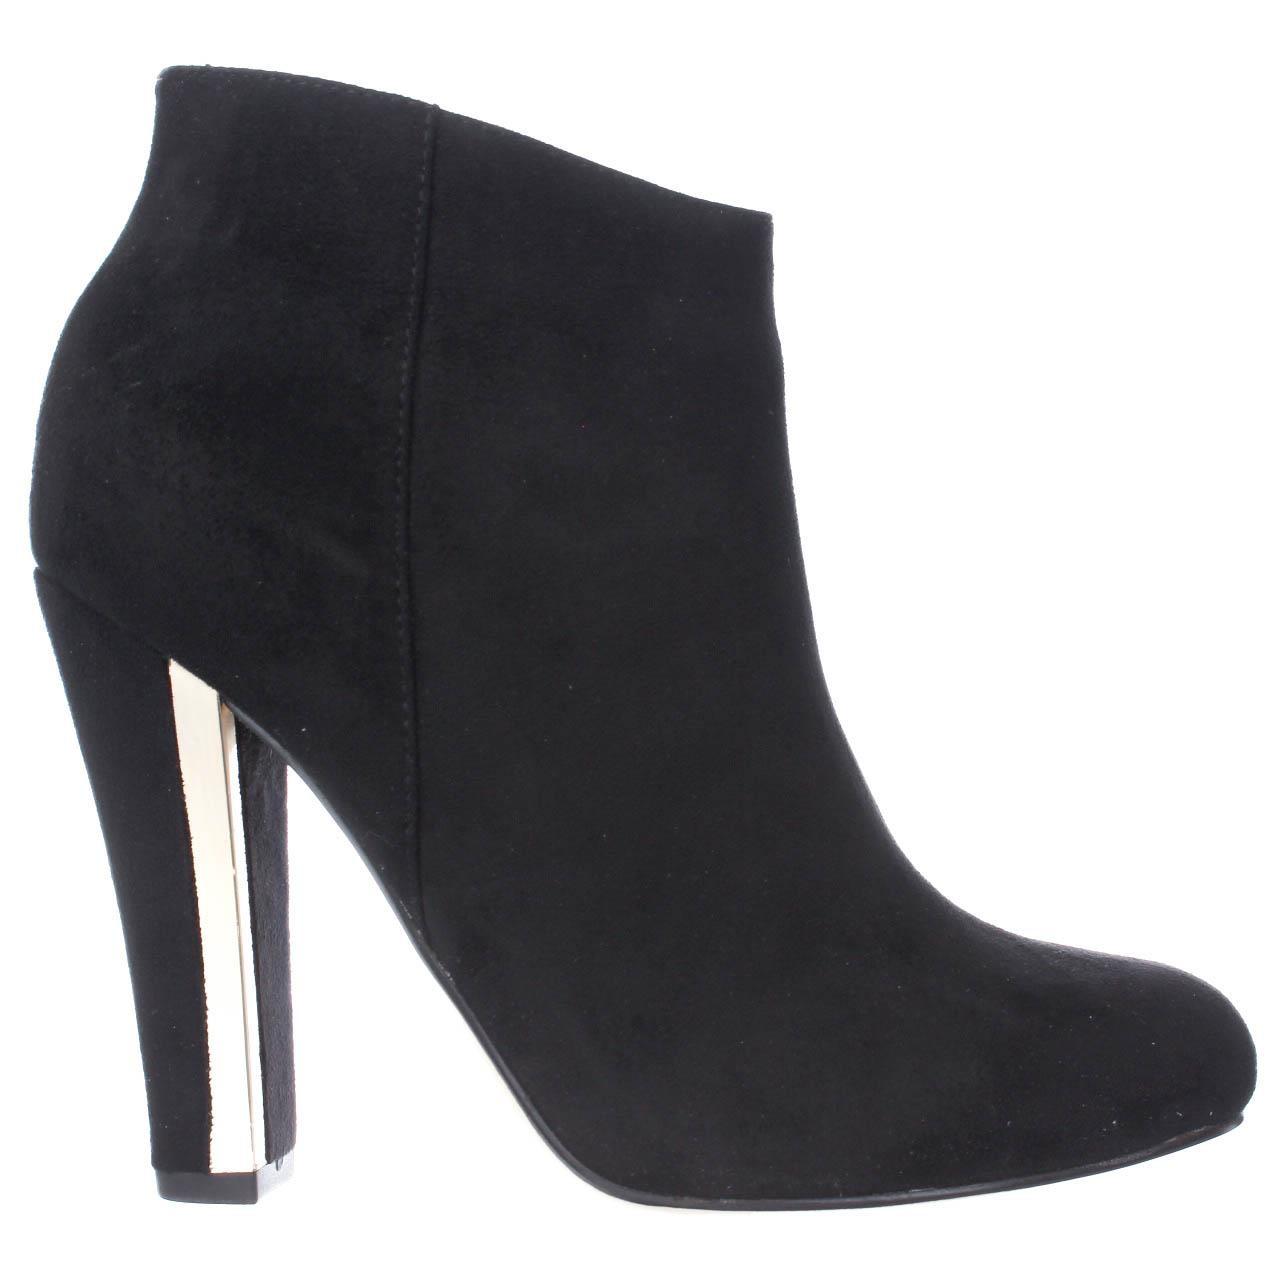 ecfff6cadb4 Call It Spring Lovelarwen Womens Boots Black 9 US   7 UK ...